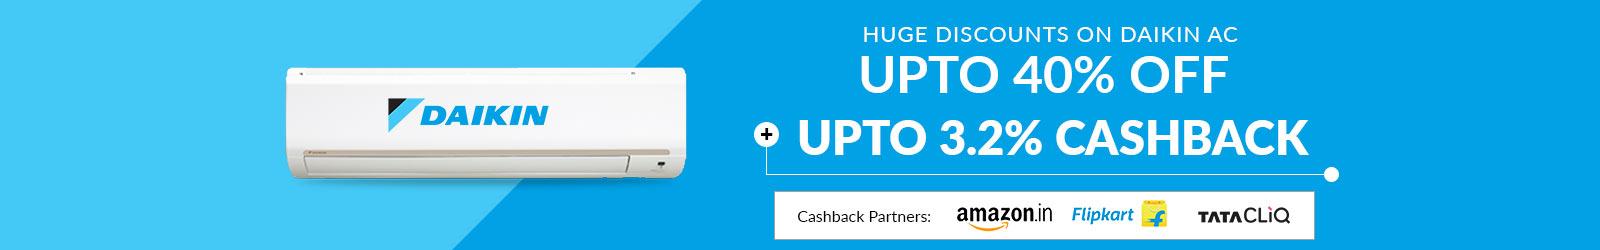 936cd2770dd Daikin AC Online Price List India  Upto 50% Off Offers